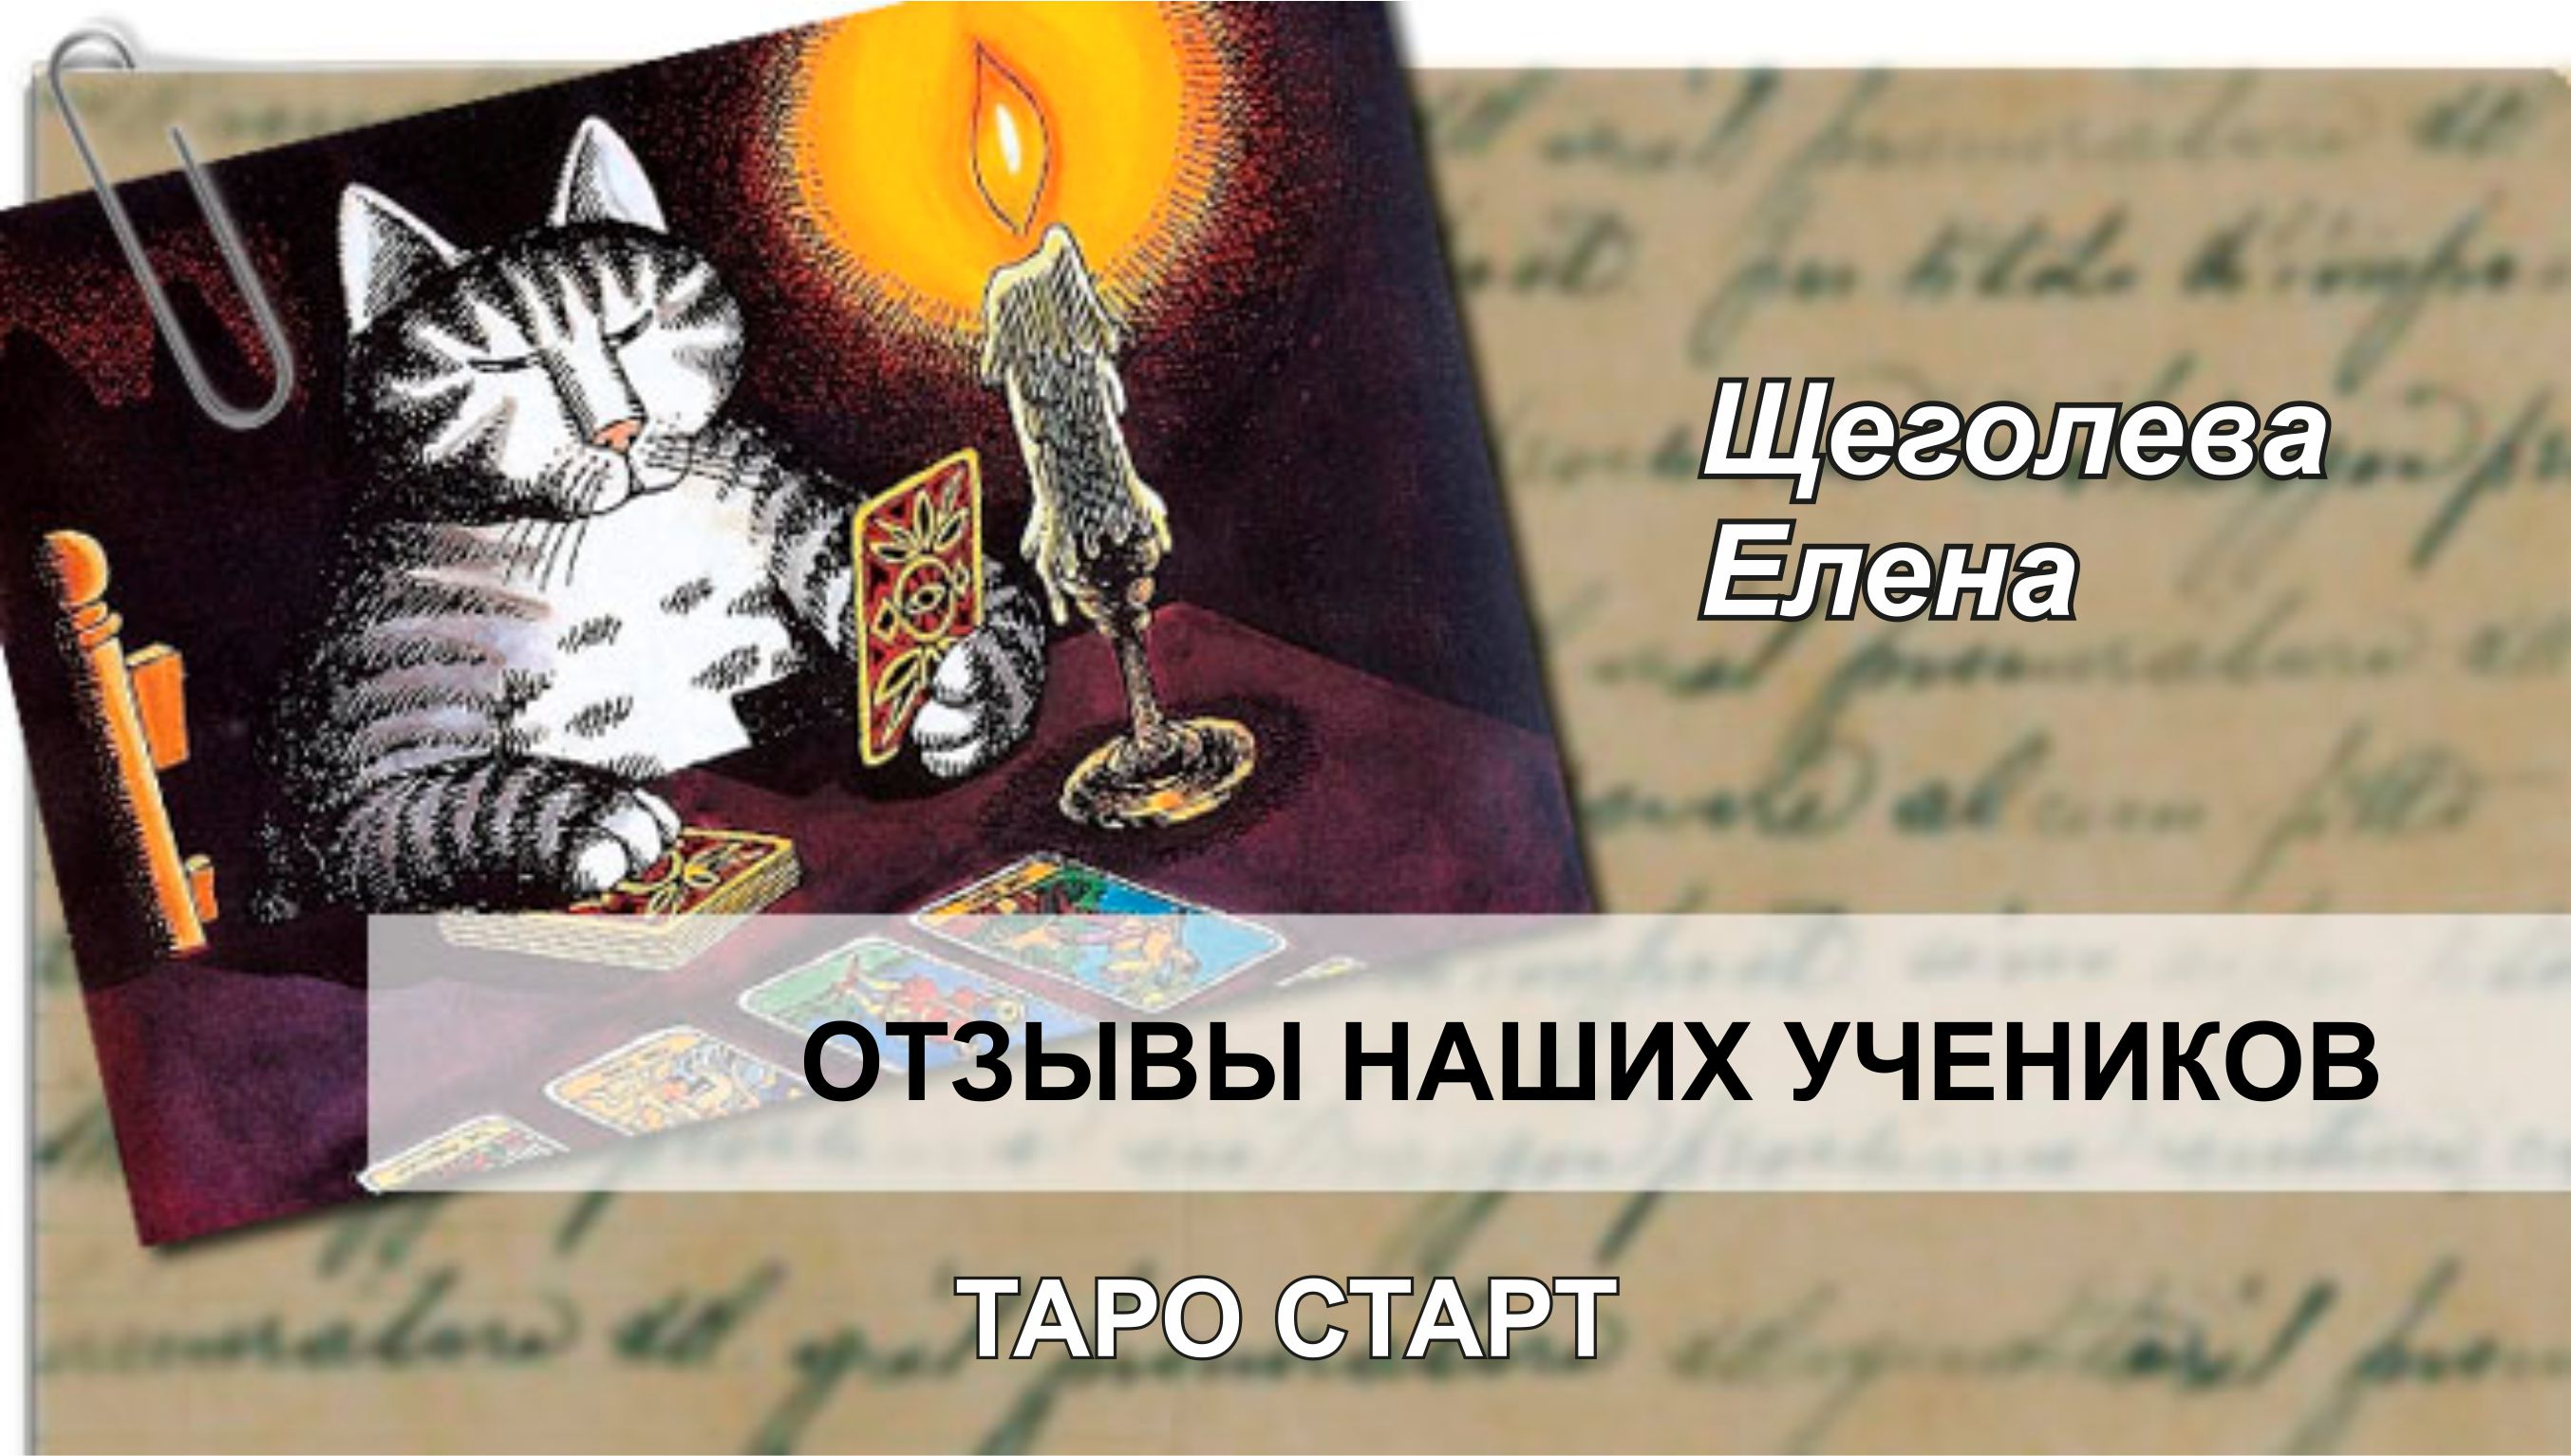 Щеголева Елена отзыв Таро Старт